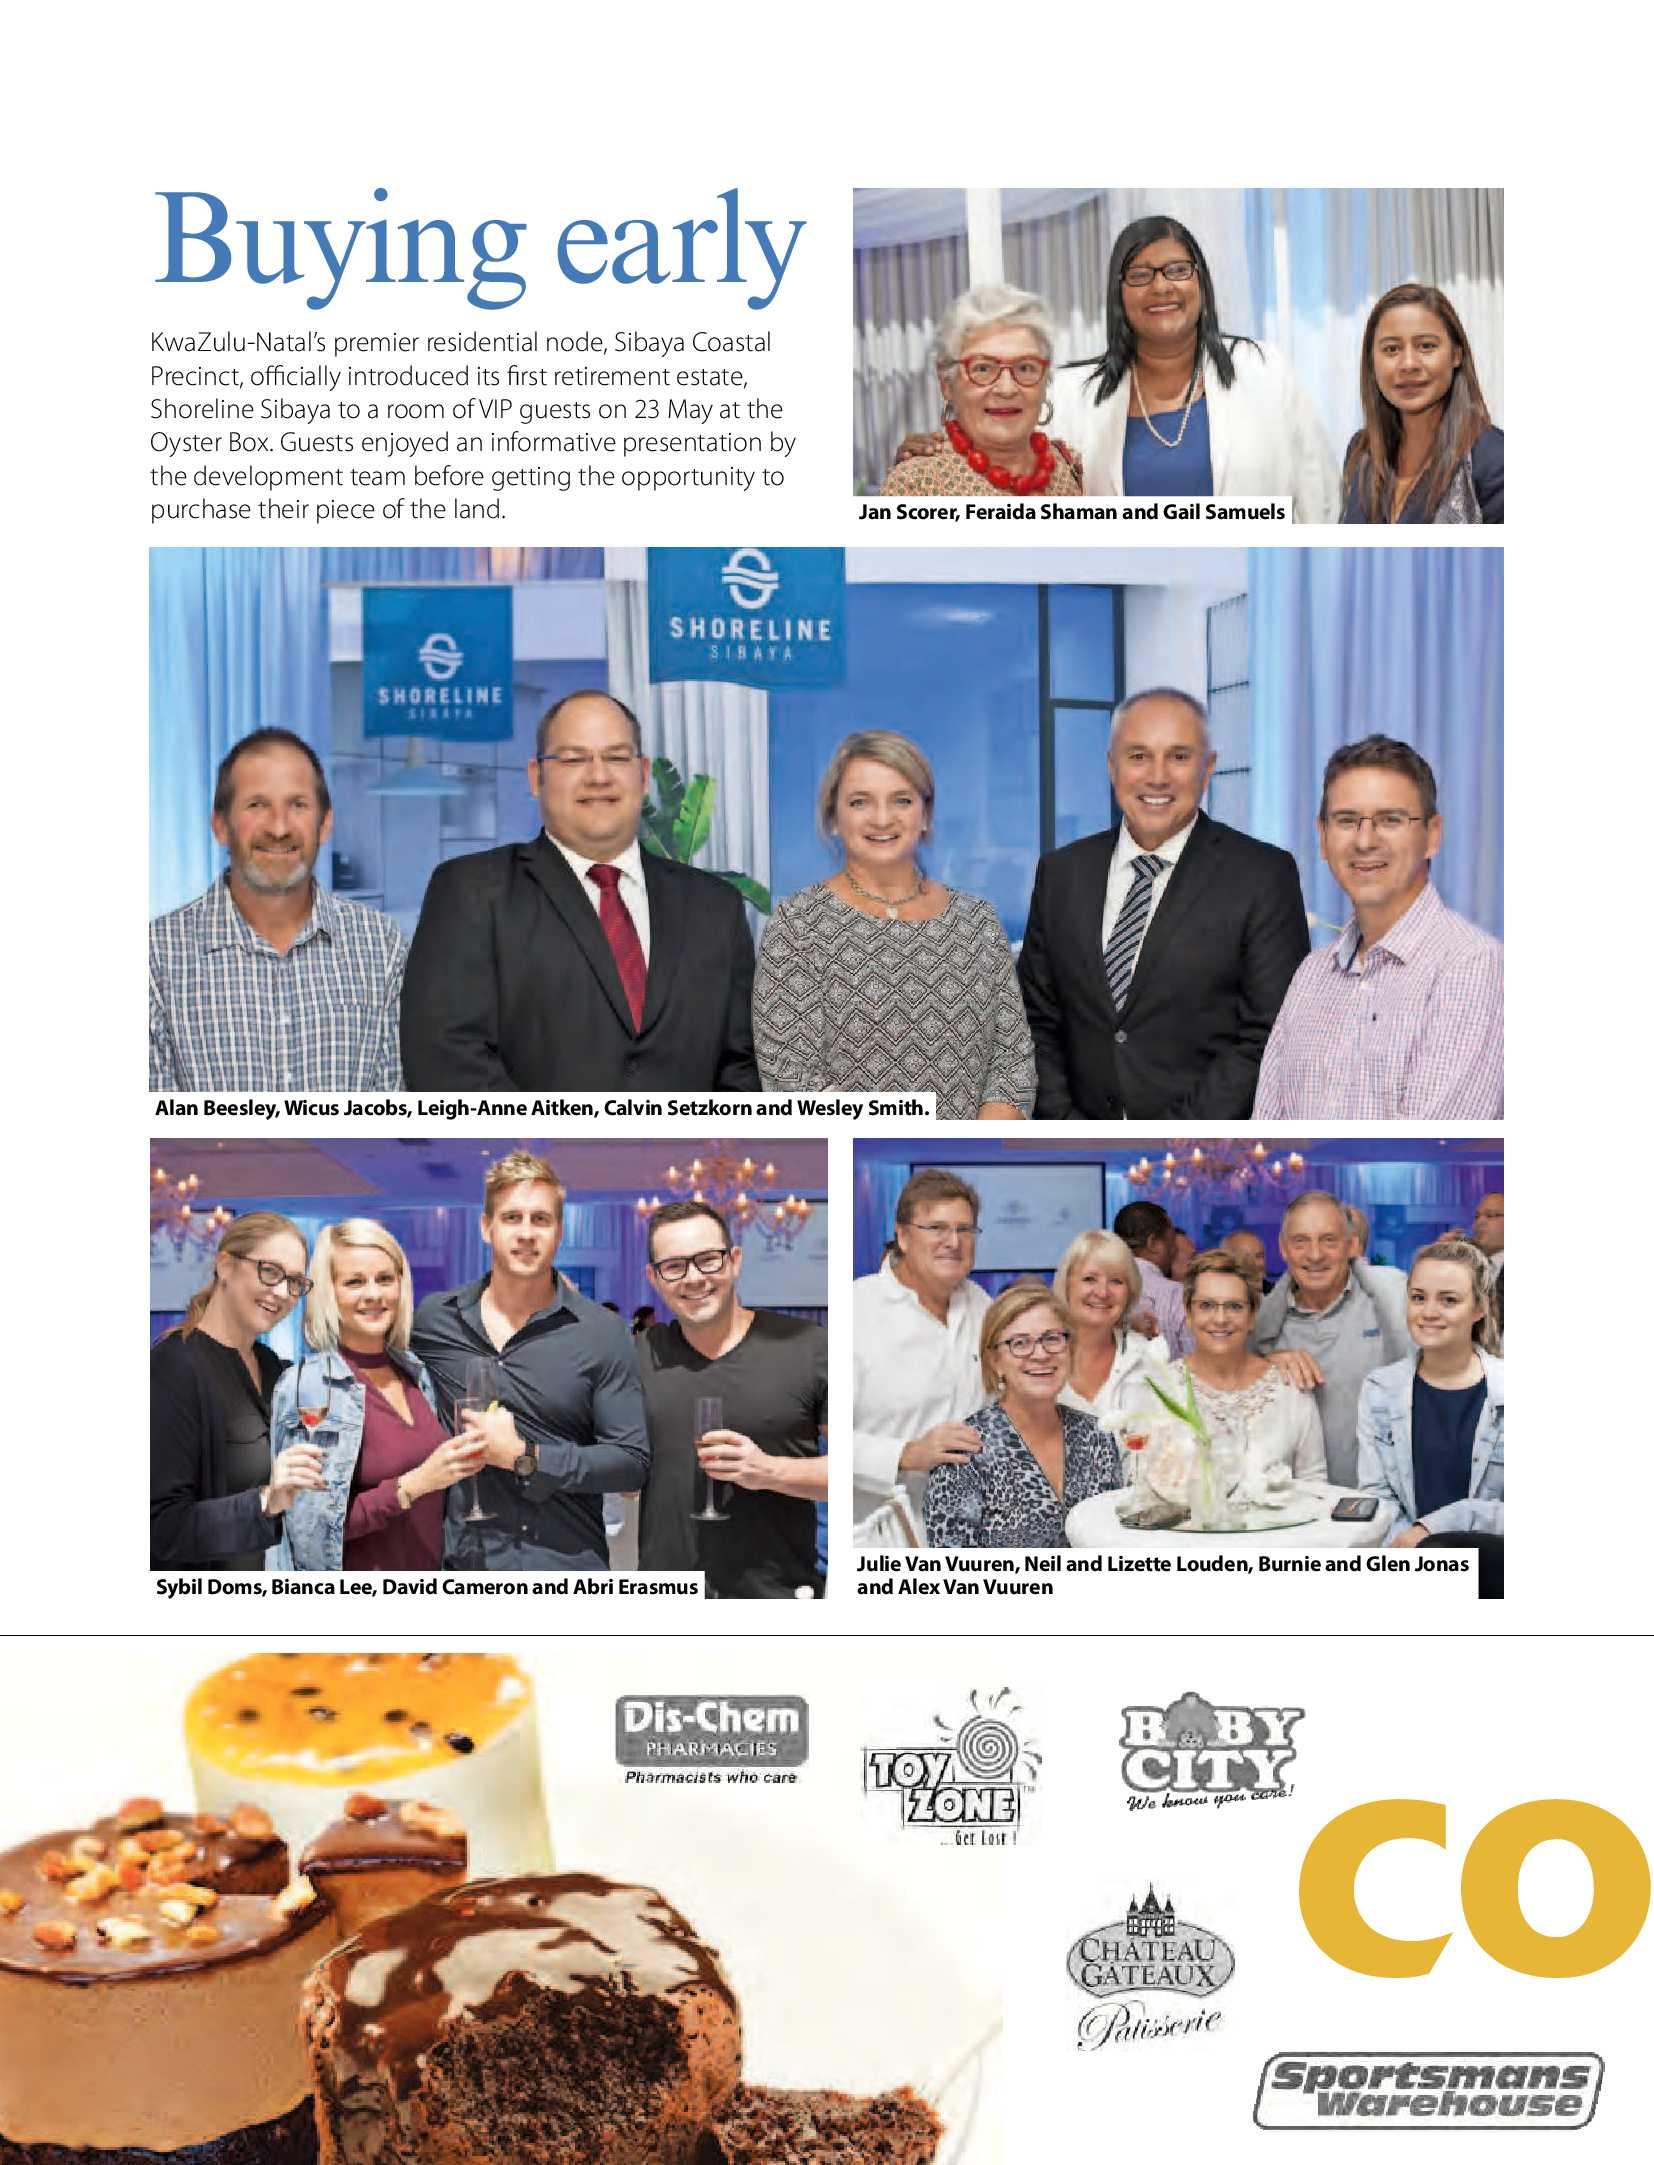 get-magazine-ballitoumhlanga-july-2017-2-epapers-page-12